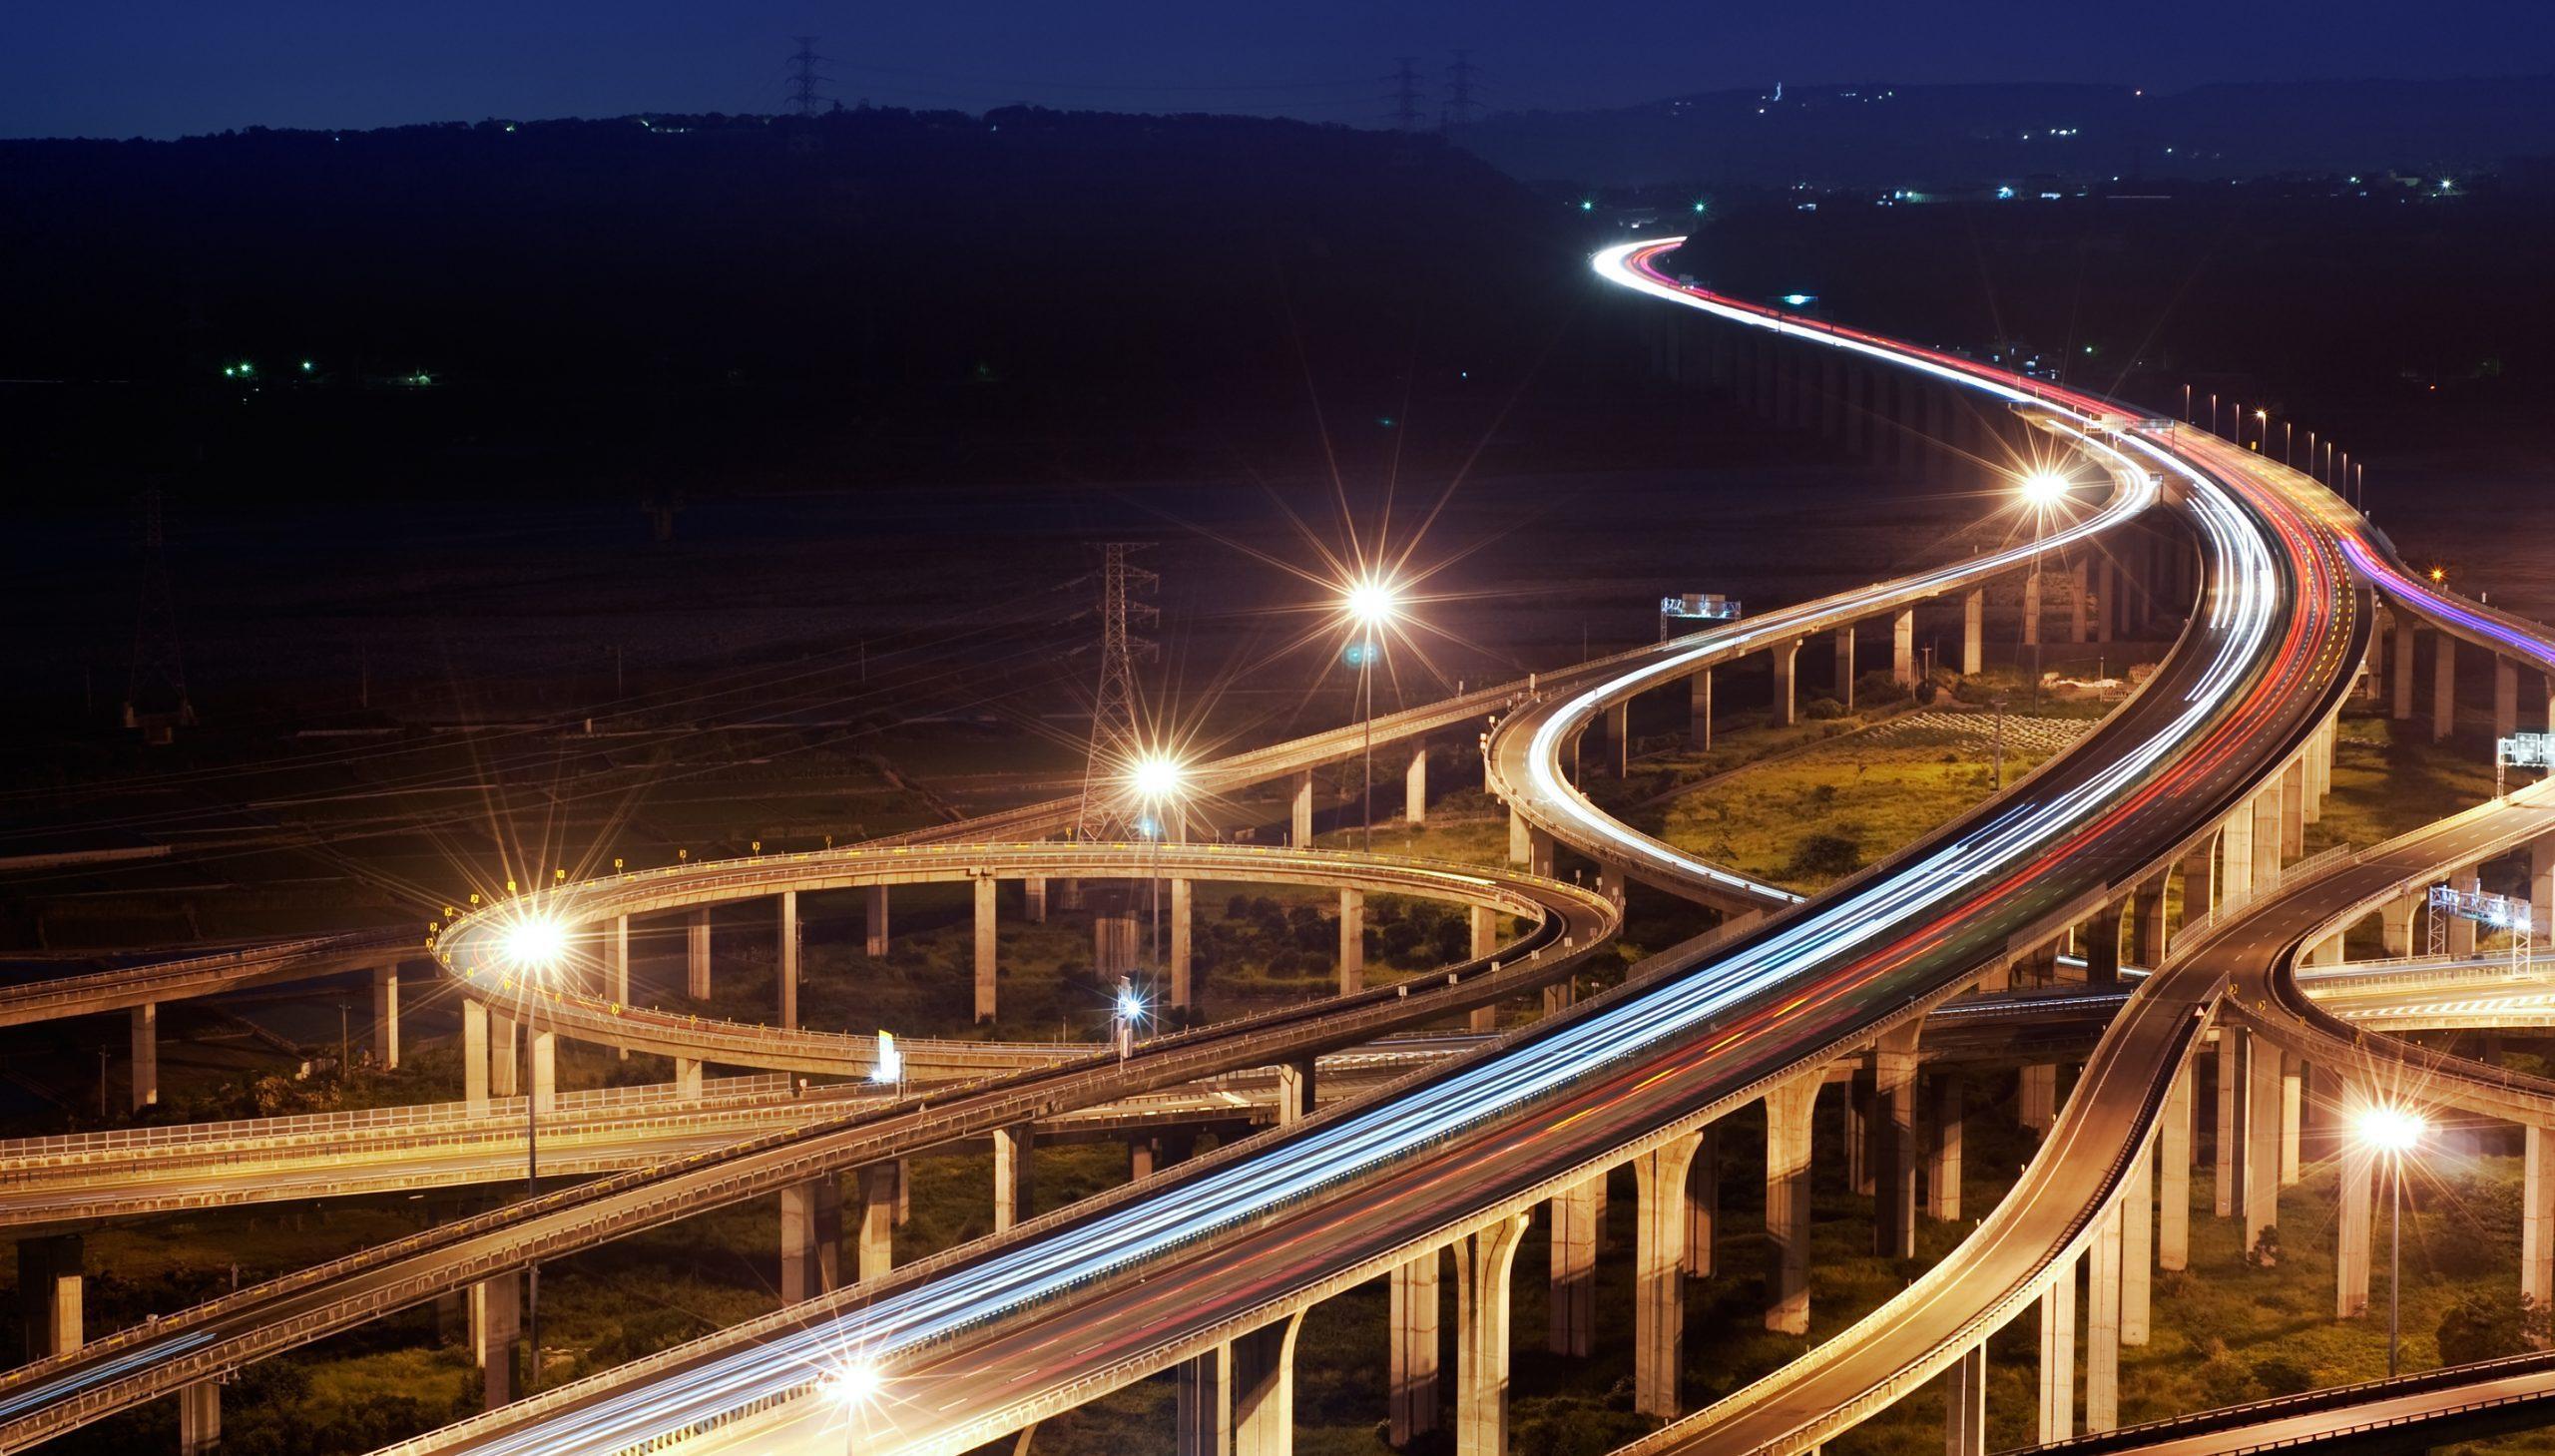 5 Impressive Benefits of LED Street Lighting